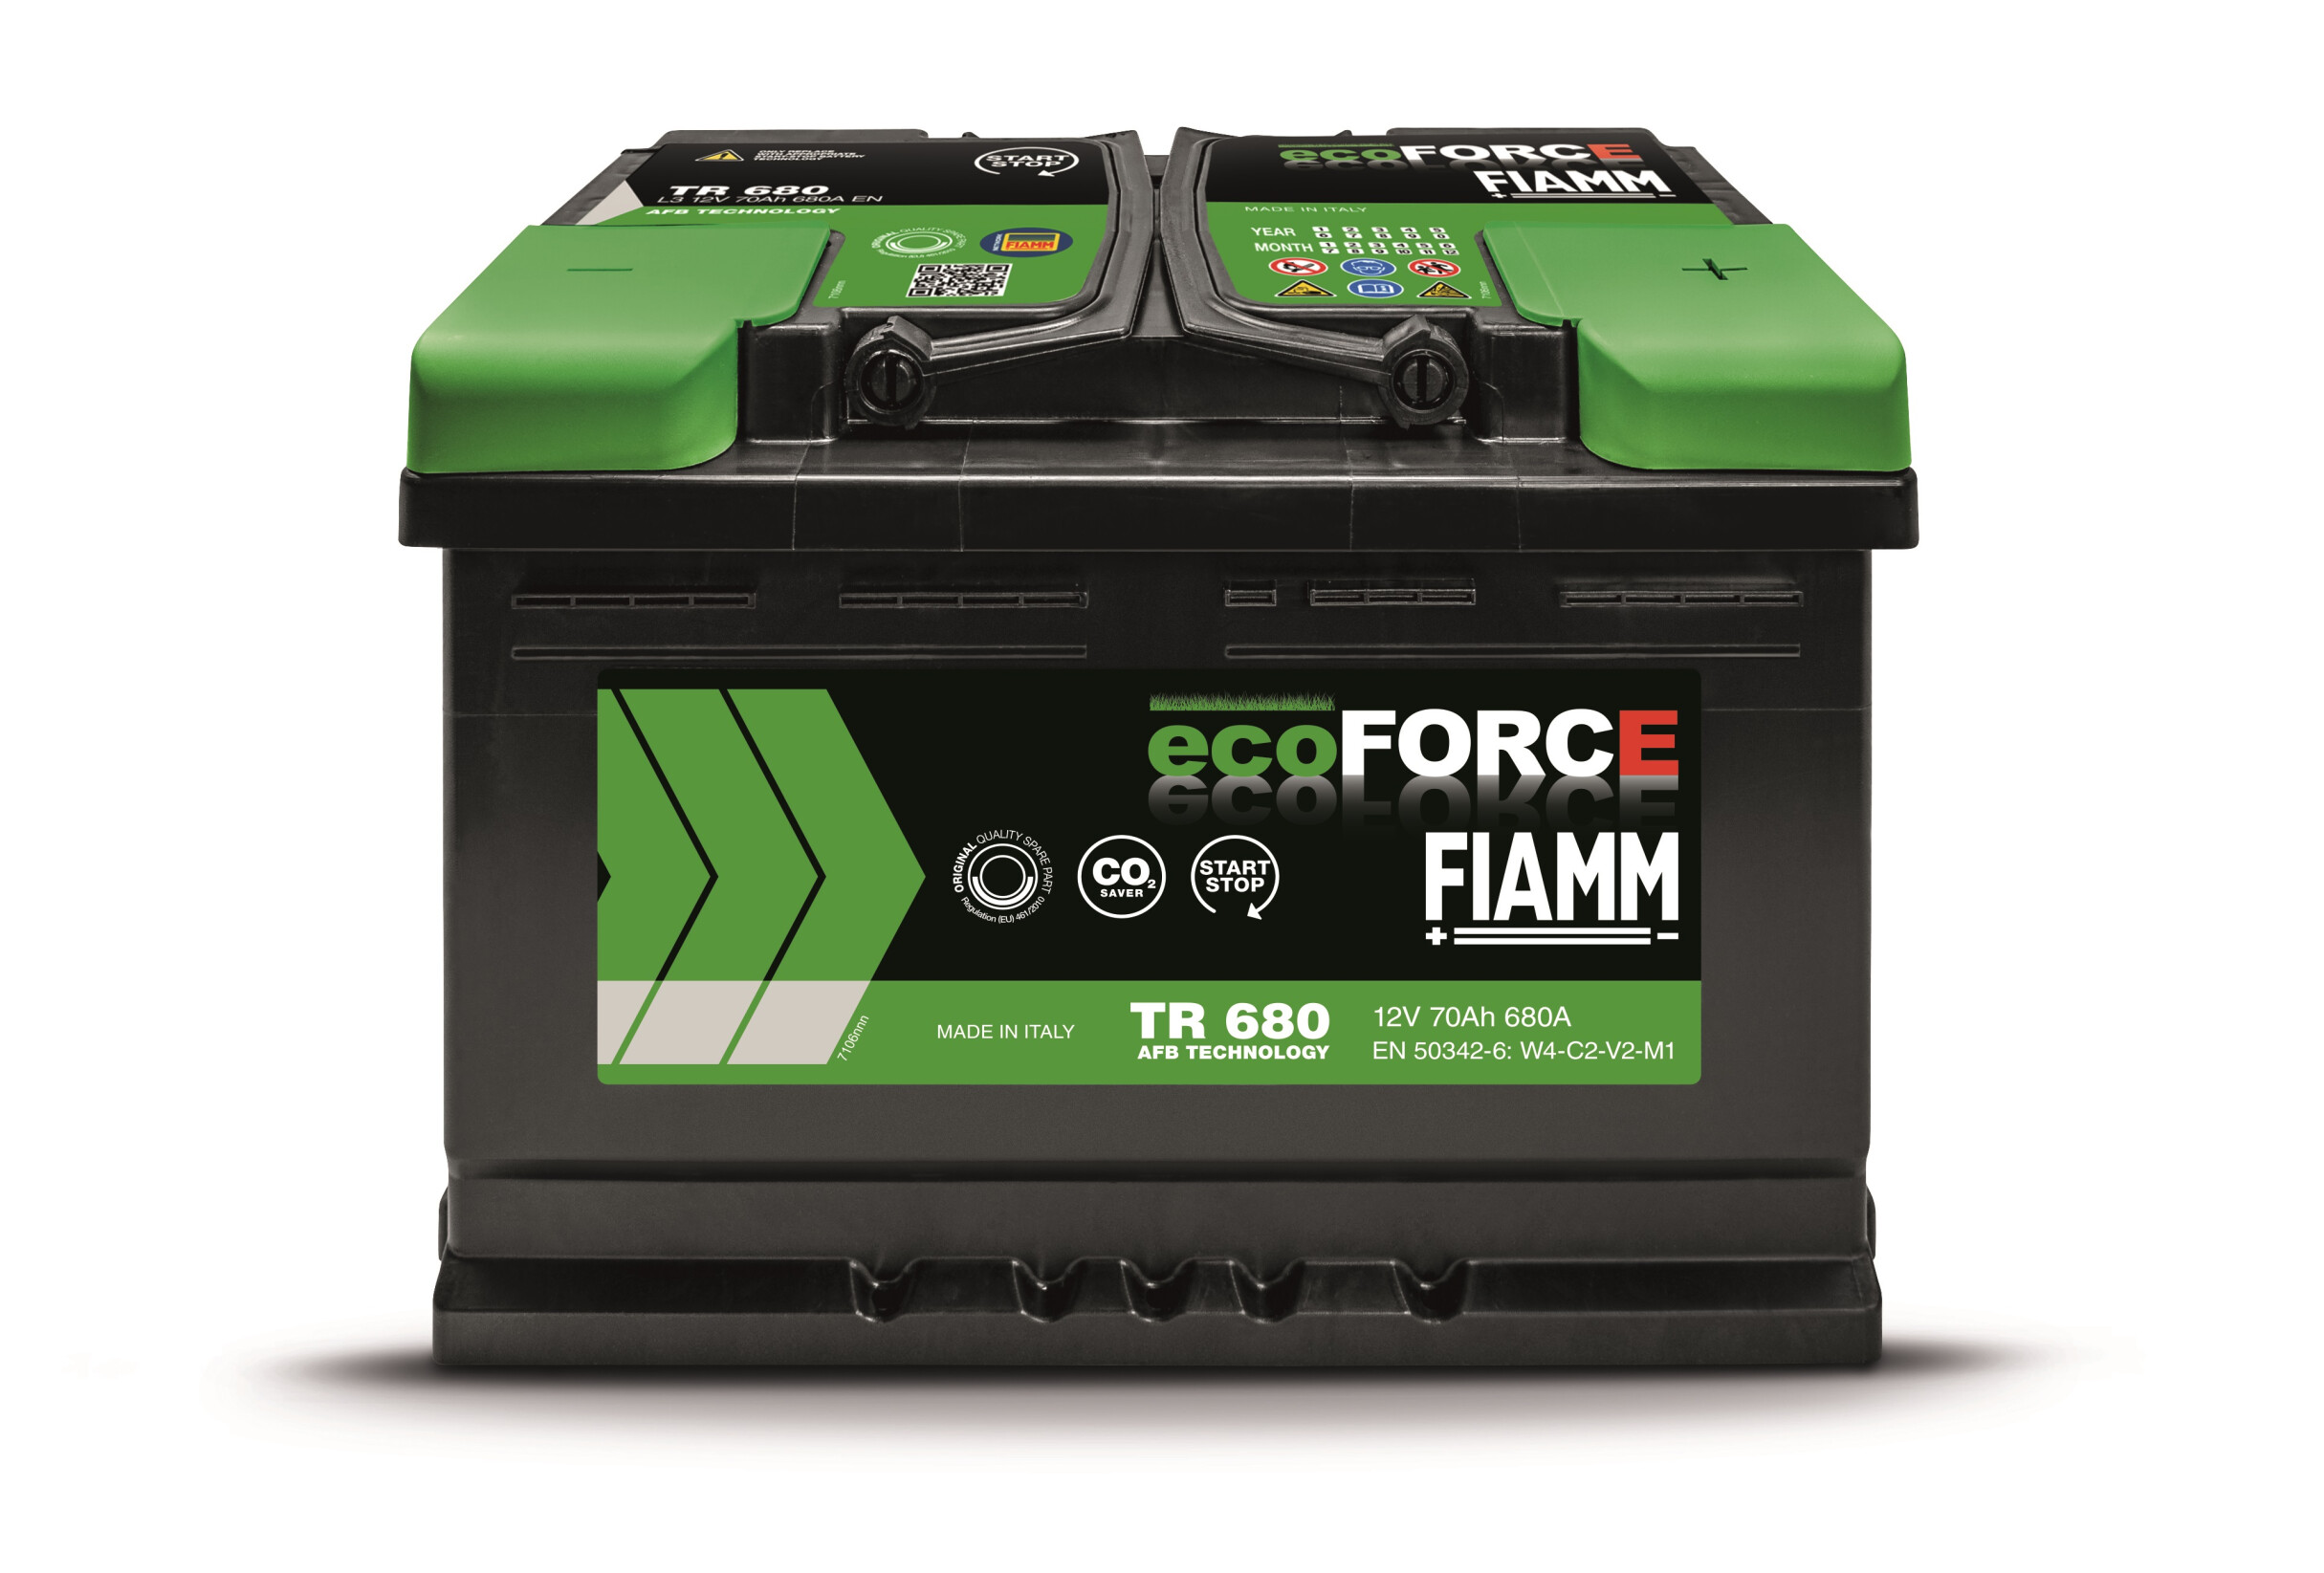 ecoFORCE AFB TR680